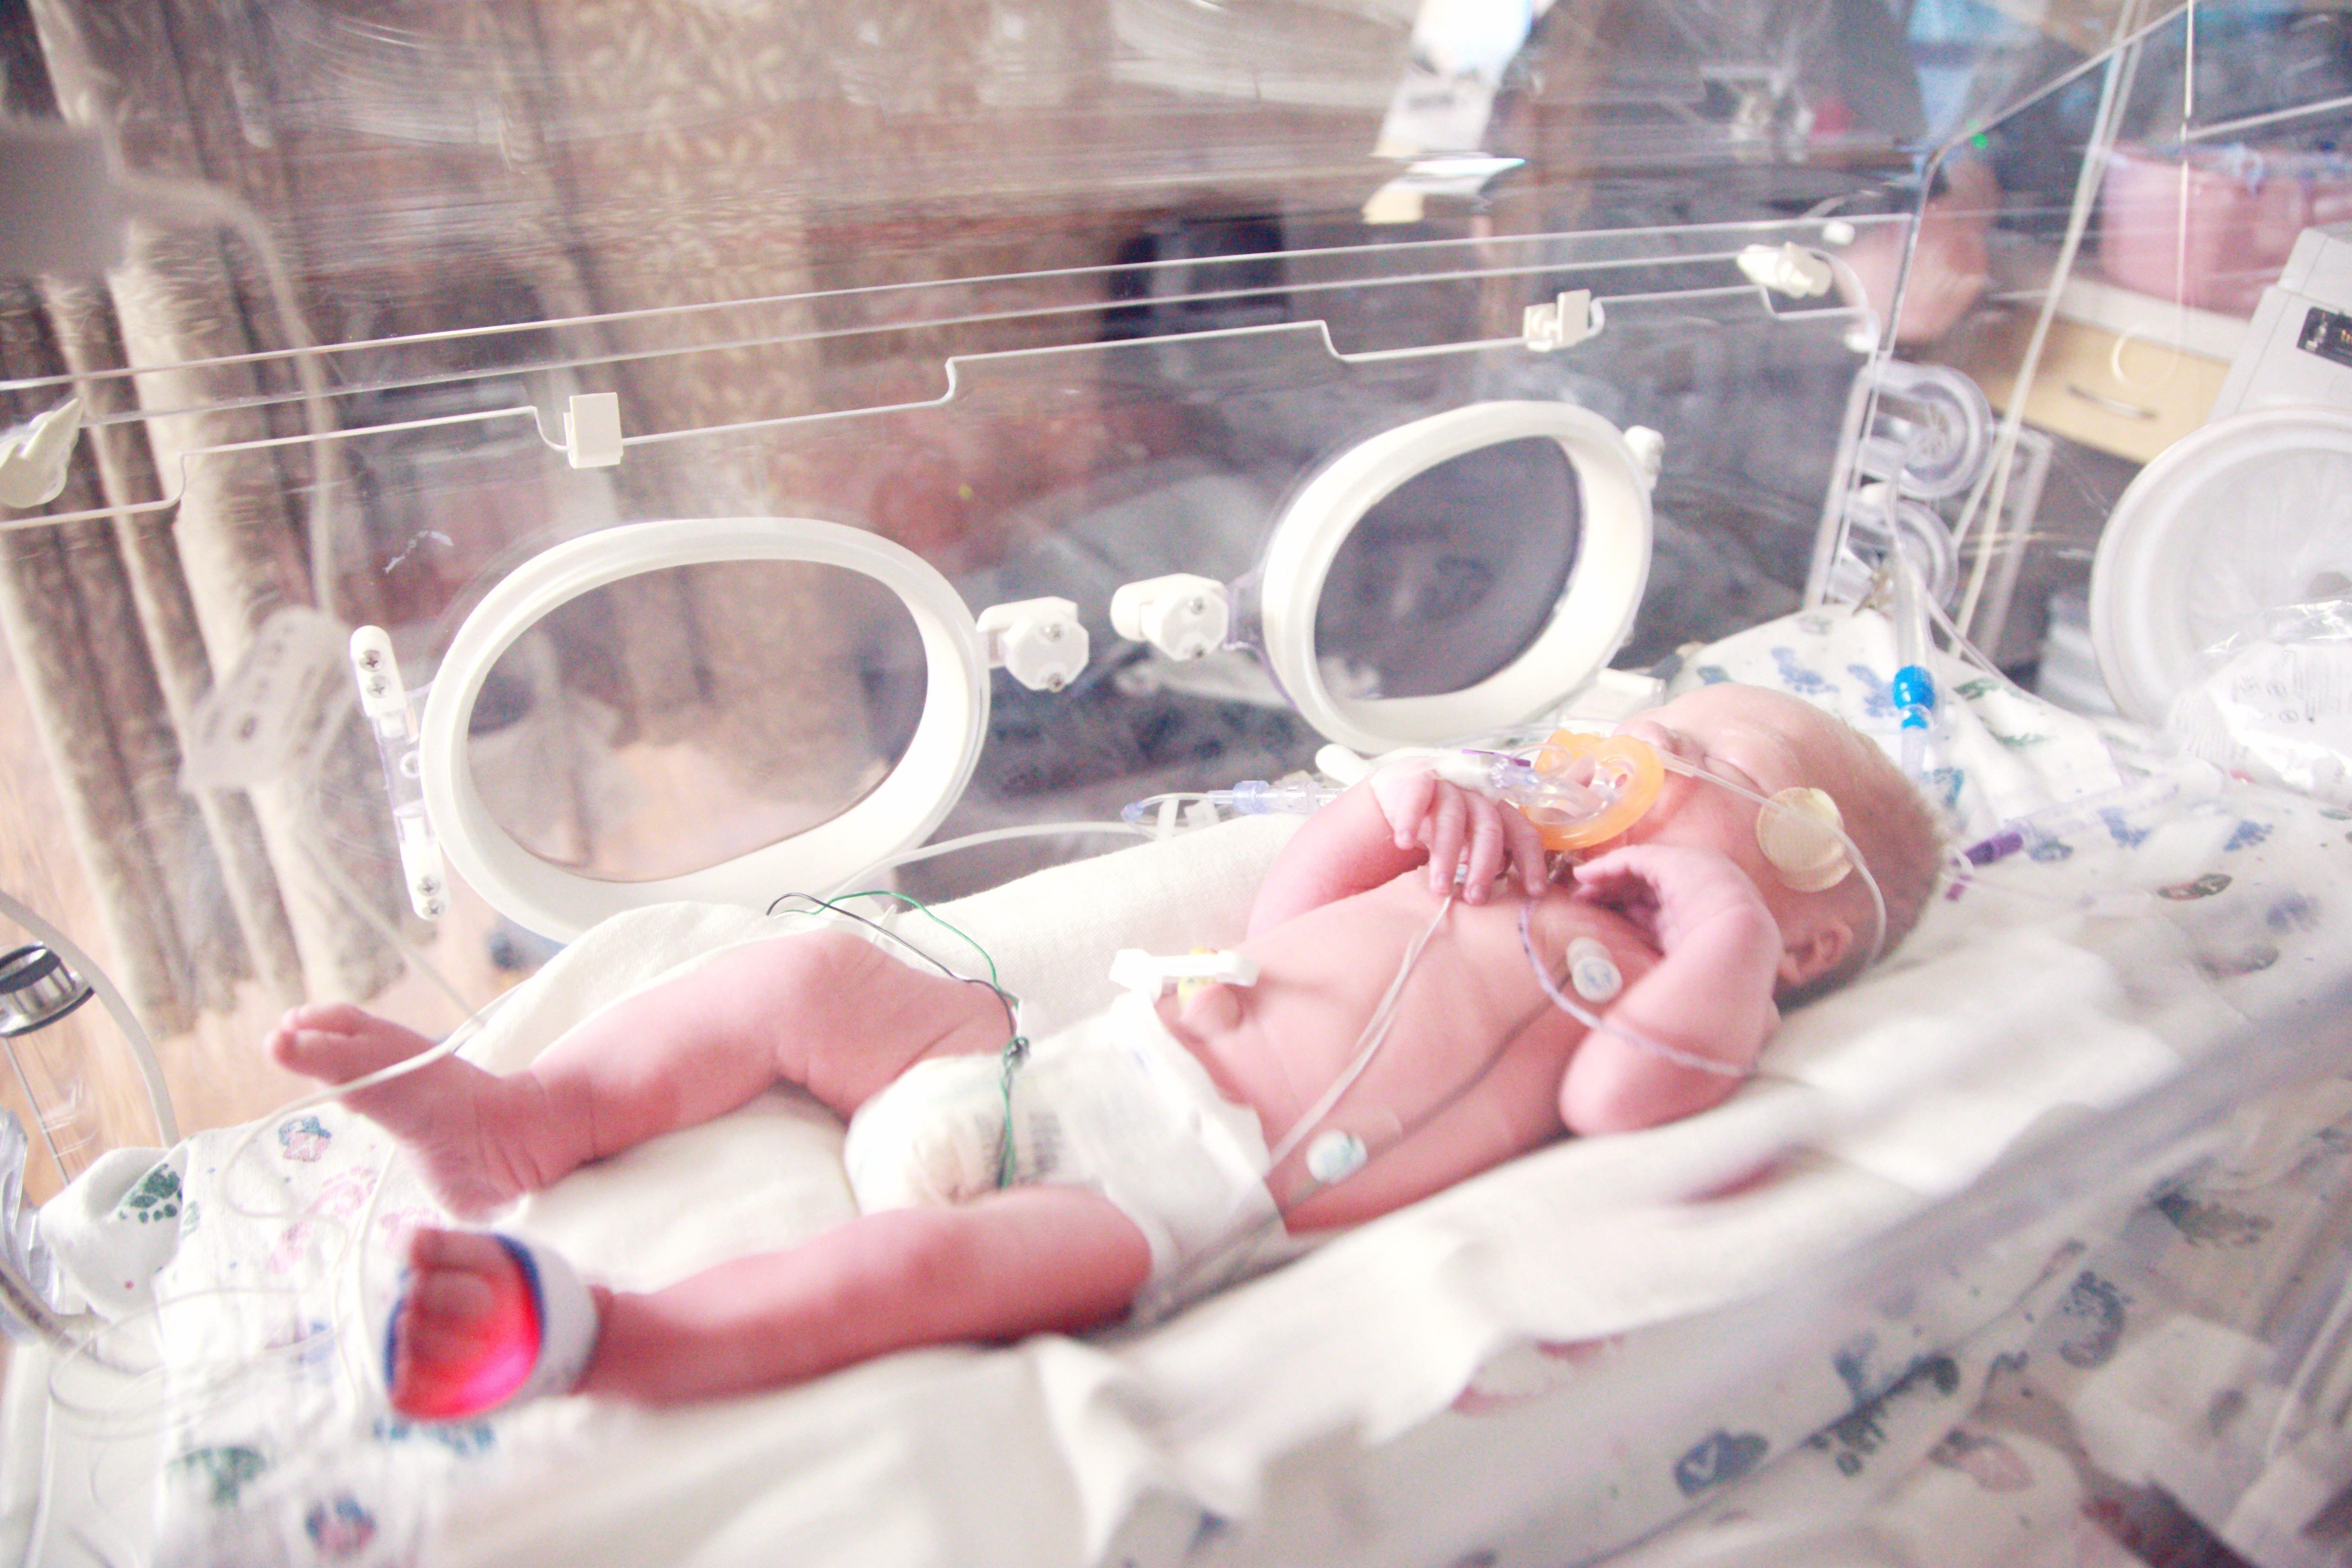 Corona vaccin en zwanger